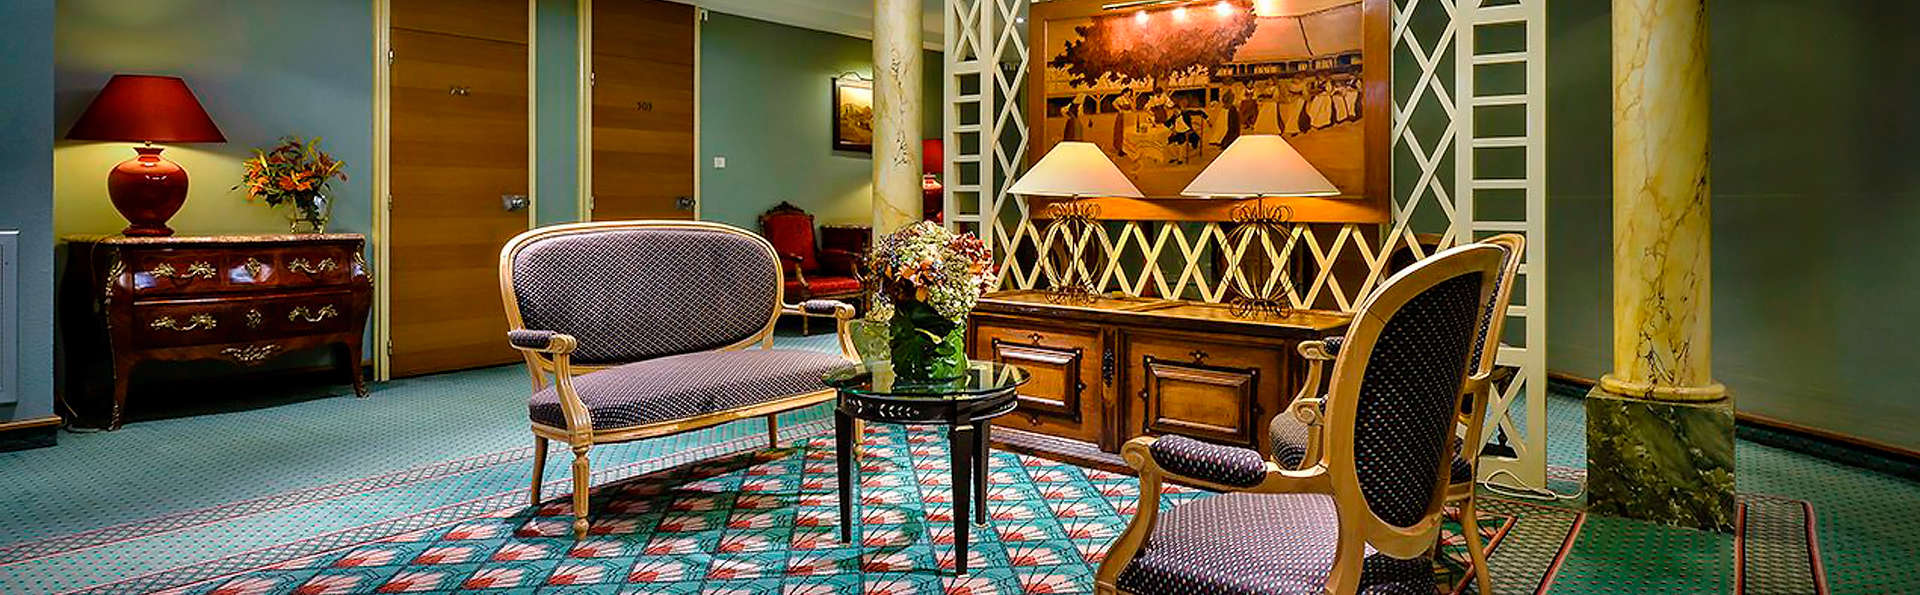 Hôtel Maison Rouge - edit_lobby.jpg